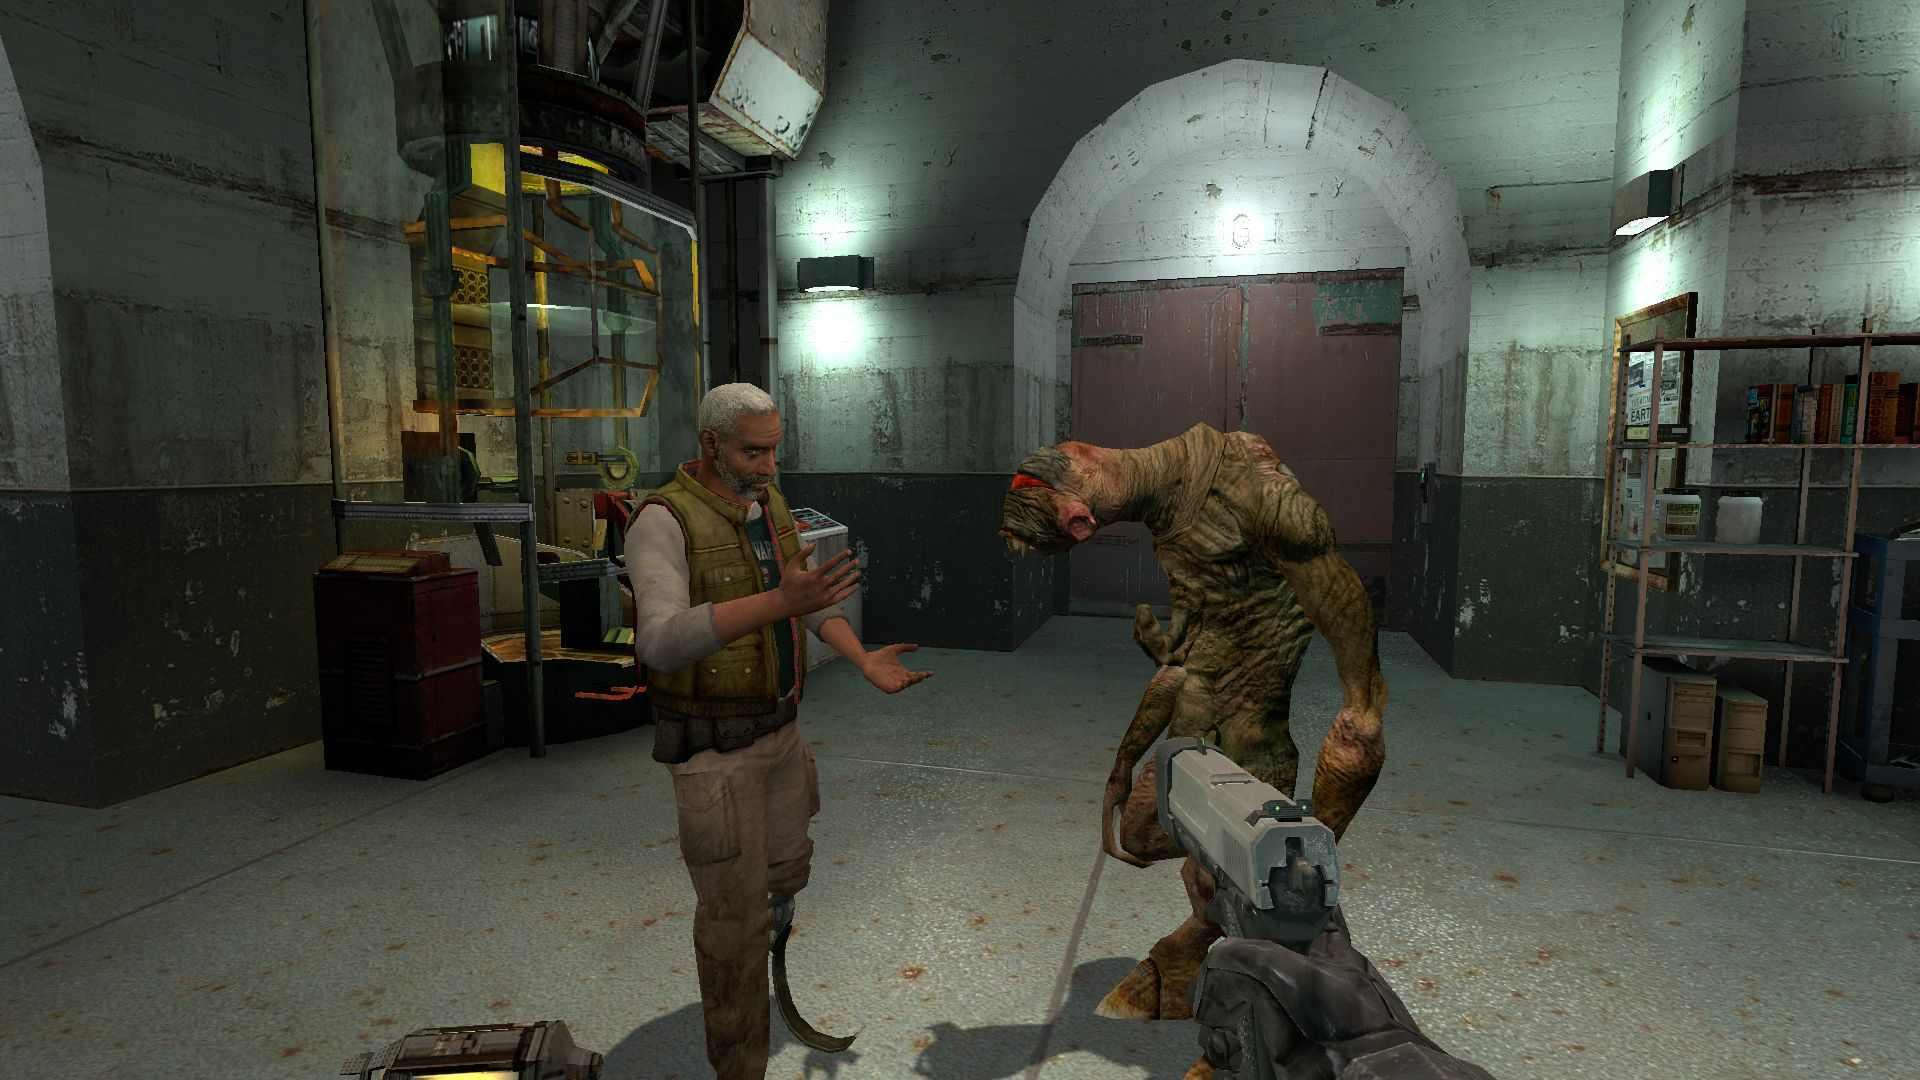 Half Life Video Game Download Free Full Game